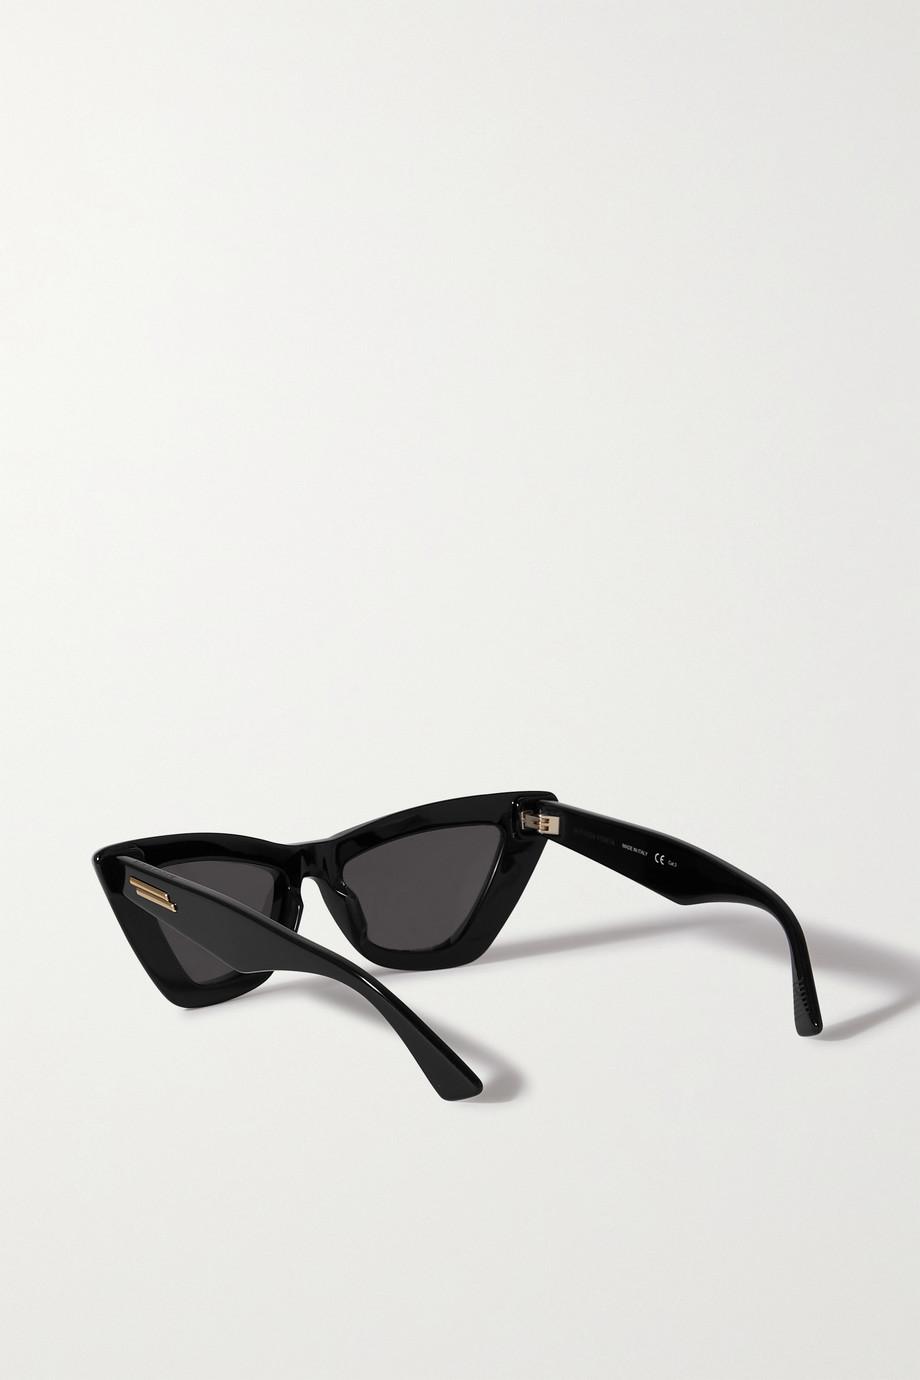 Bottega Veneta Sonnenbrille mit Cat-Eye-Rahmen aus Azetat